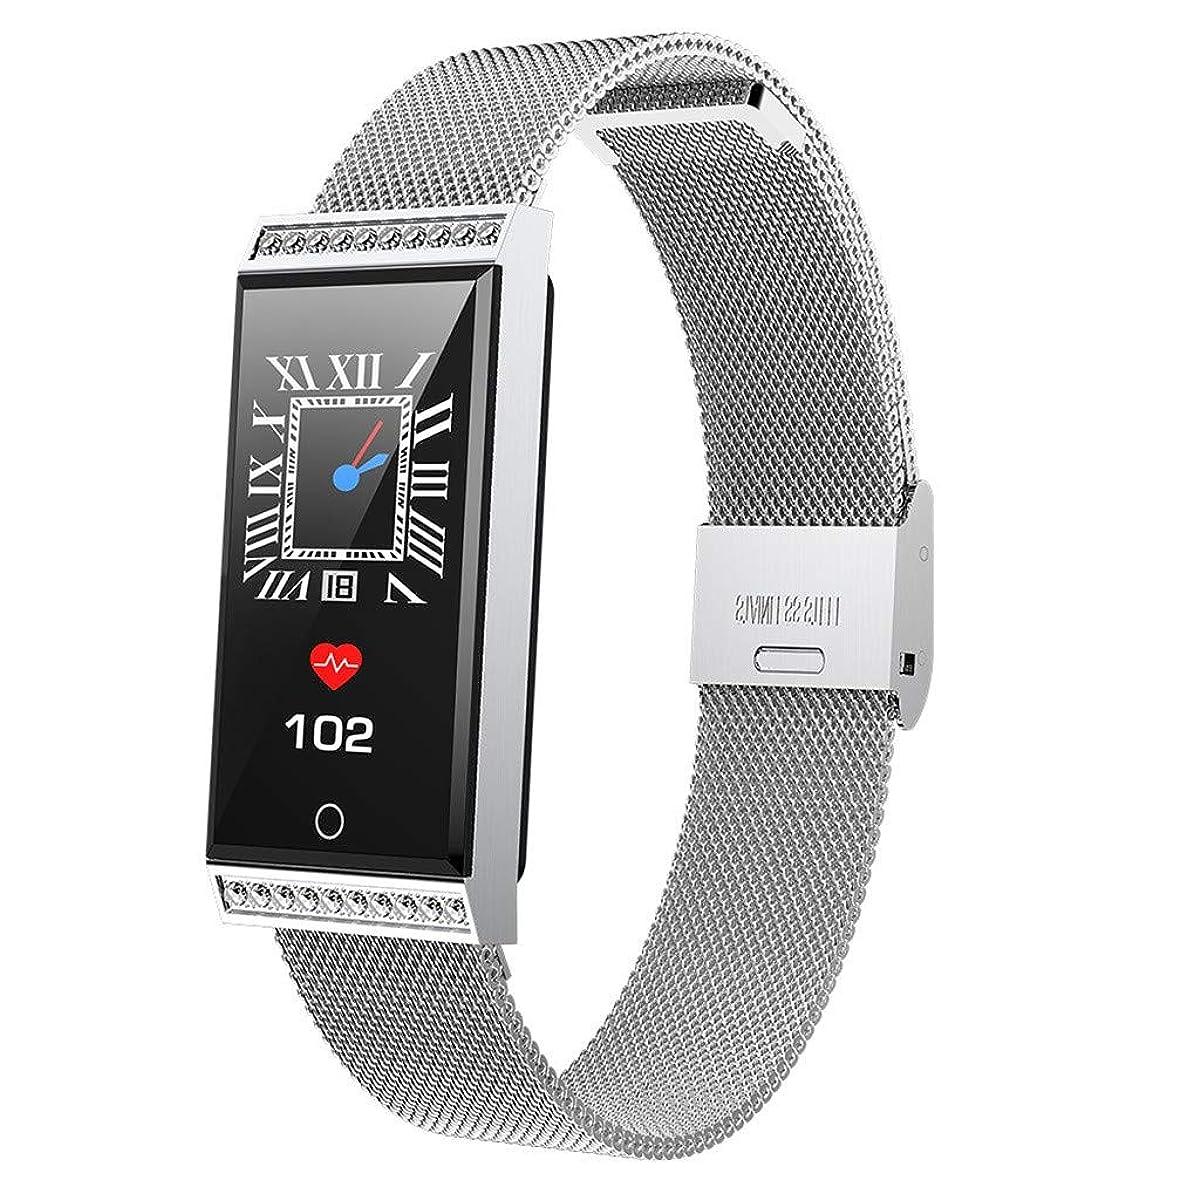 GXOK Smart Watch IP68 Waterproof Tracker Heart Rate Monitor Sleep Monitoring Sport Smart Watch,Pedometer Watch for Kids Women and Men